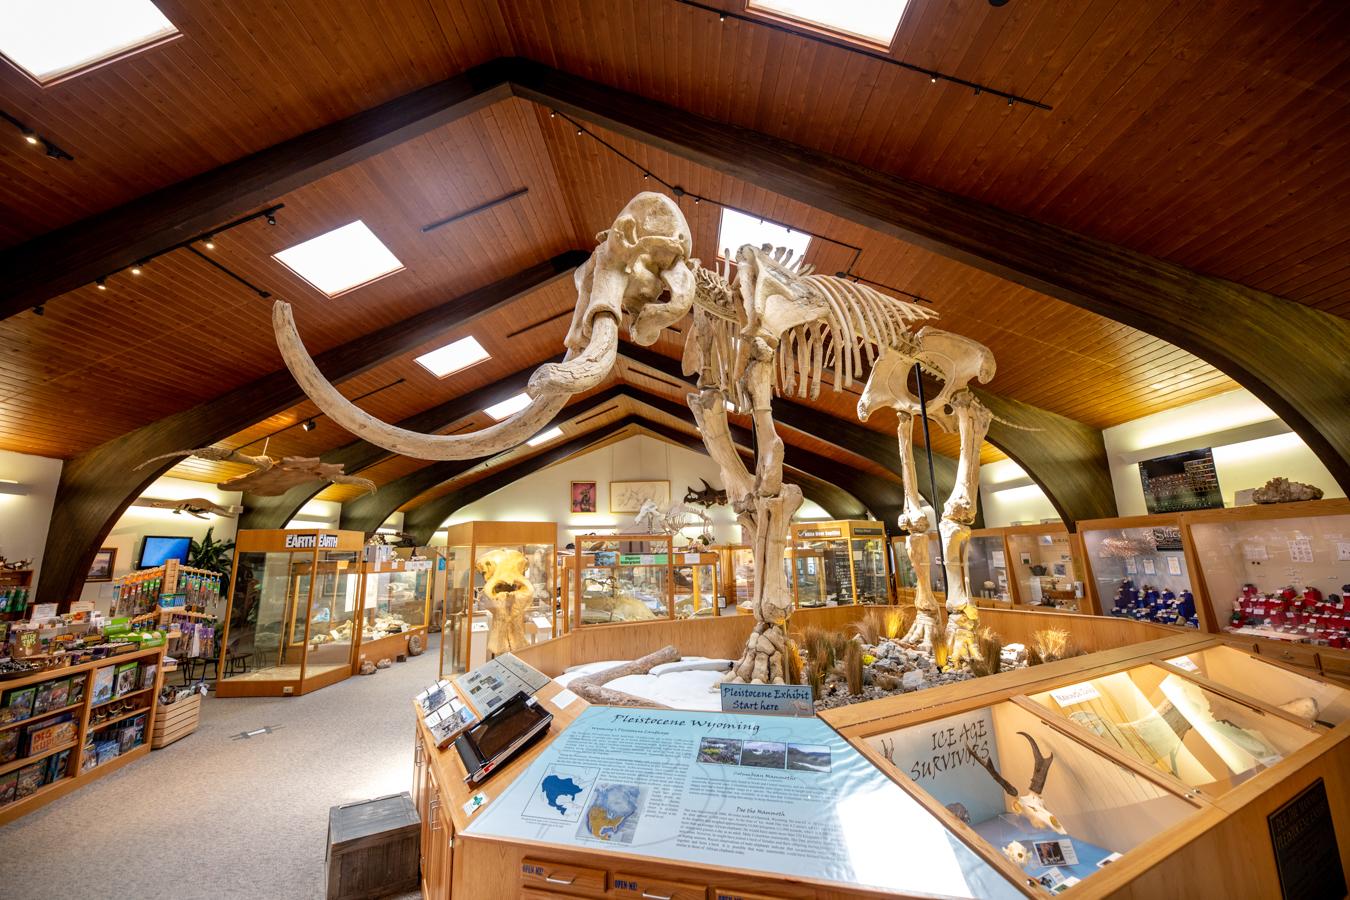 Tate Geological Museum